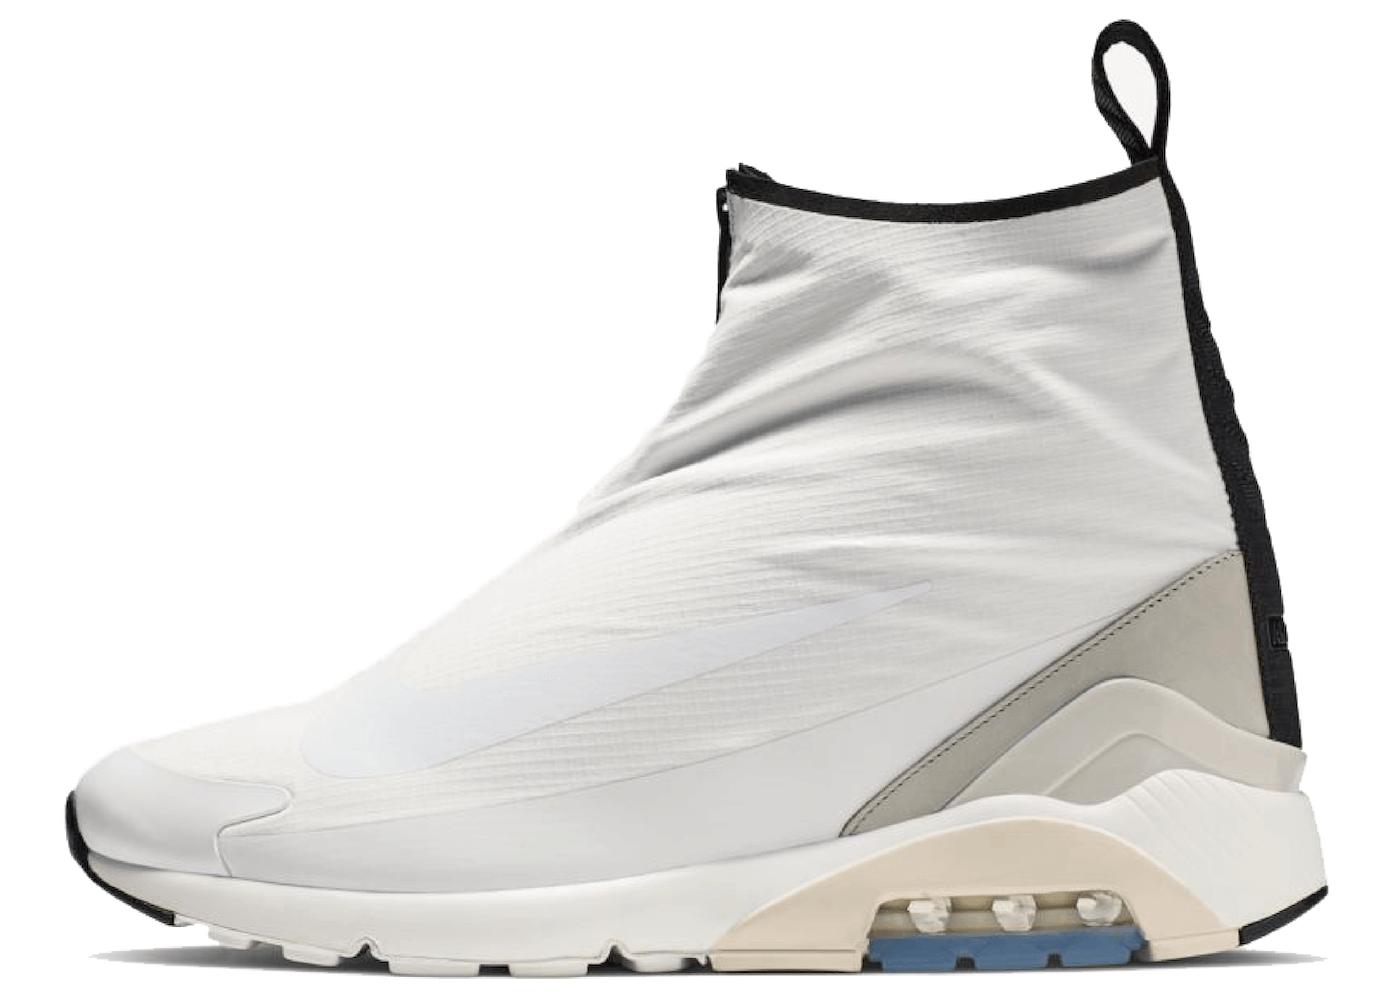 Nike Air Max 180 High Ambush Whiteの写真